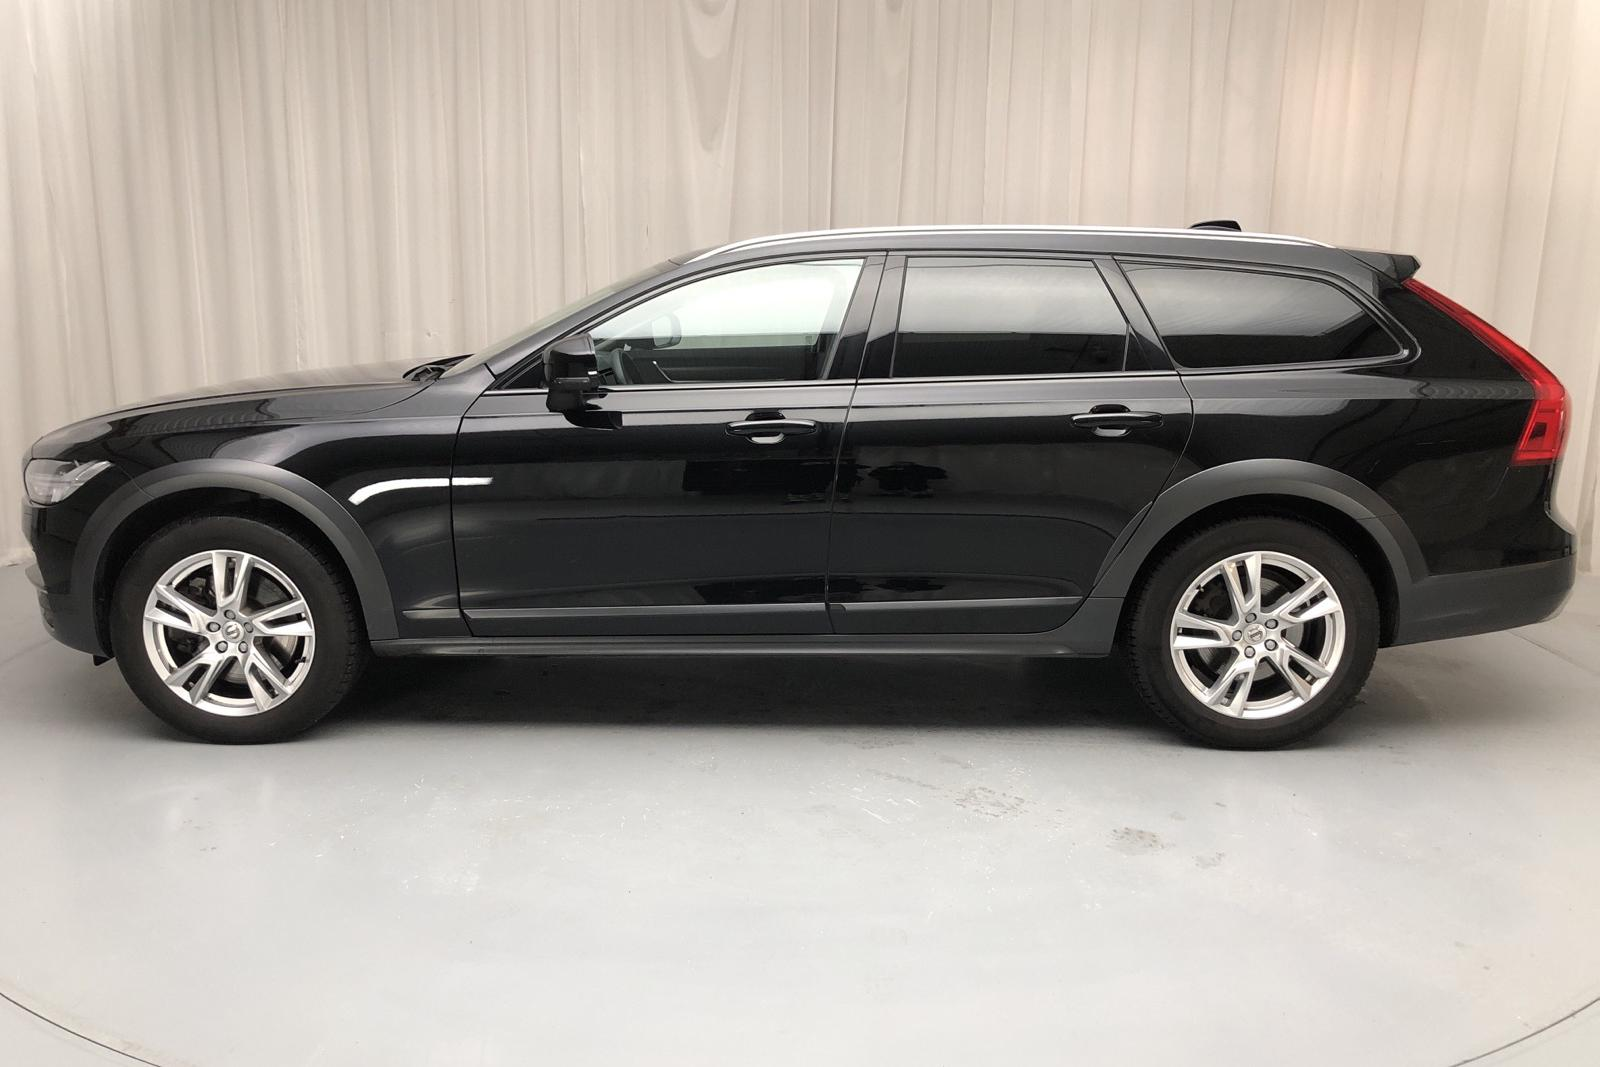 Volvo V90 D4 Cross Country AWD (190hk) - 3 432 mil - Automat - svart - 2019